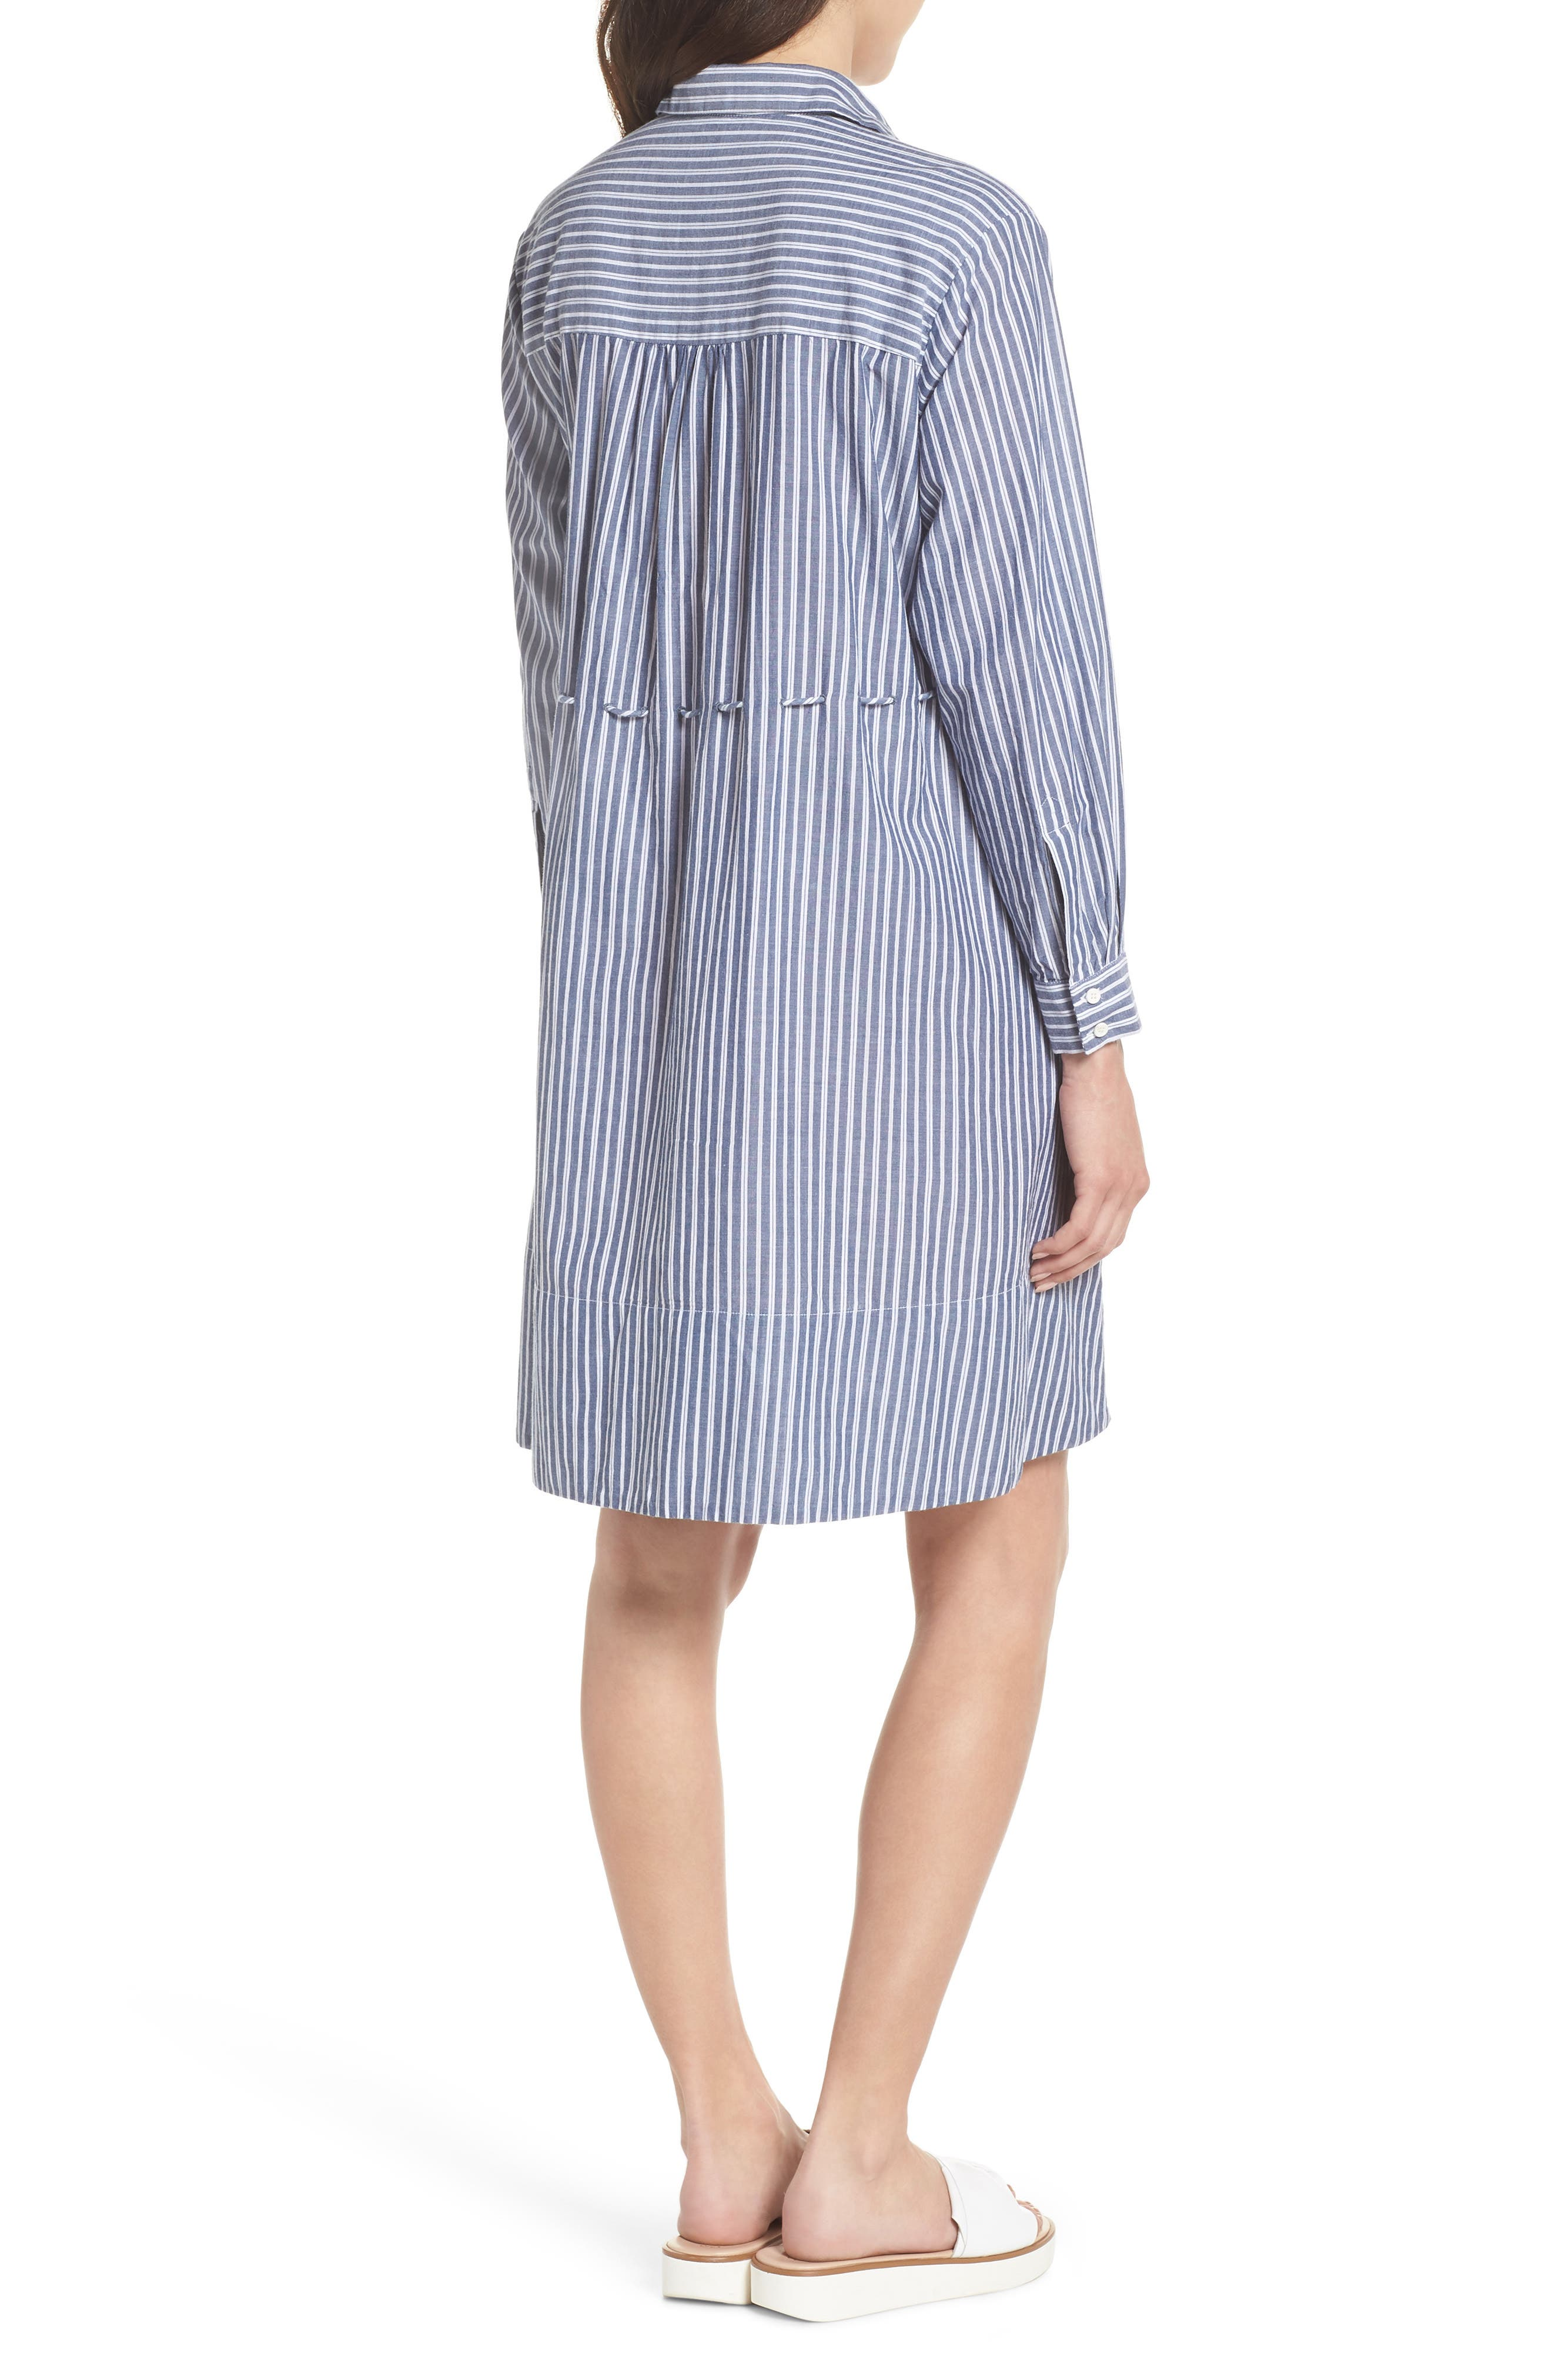 Tatus Stripe Drawstring Cotton Shirtdress,                             Alternate thumbnail 2, color,                             452